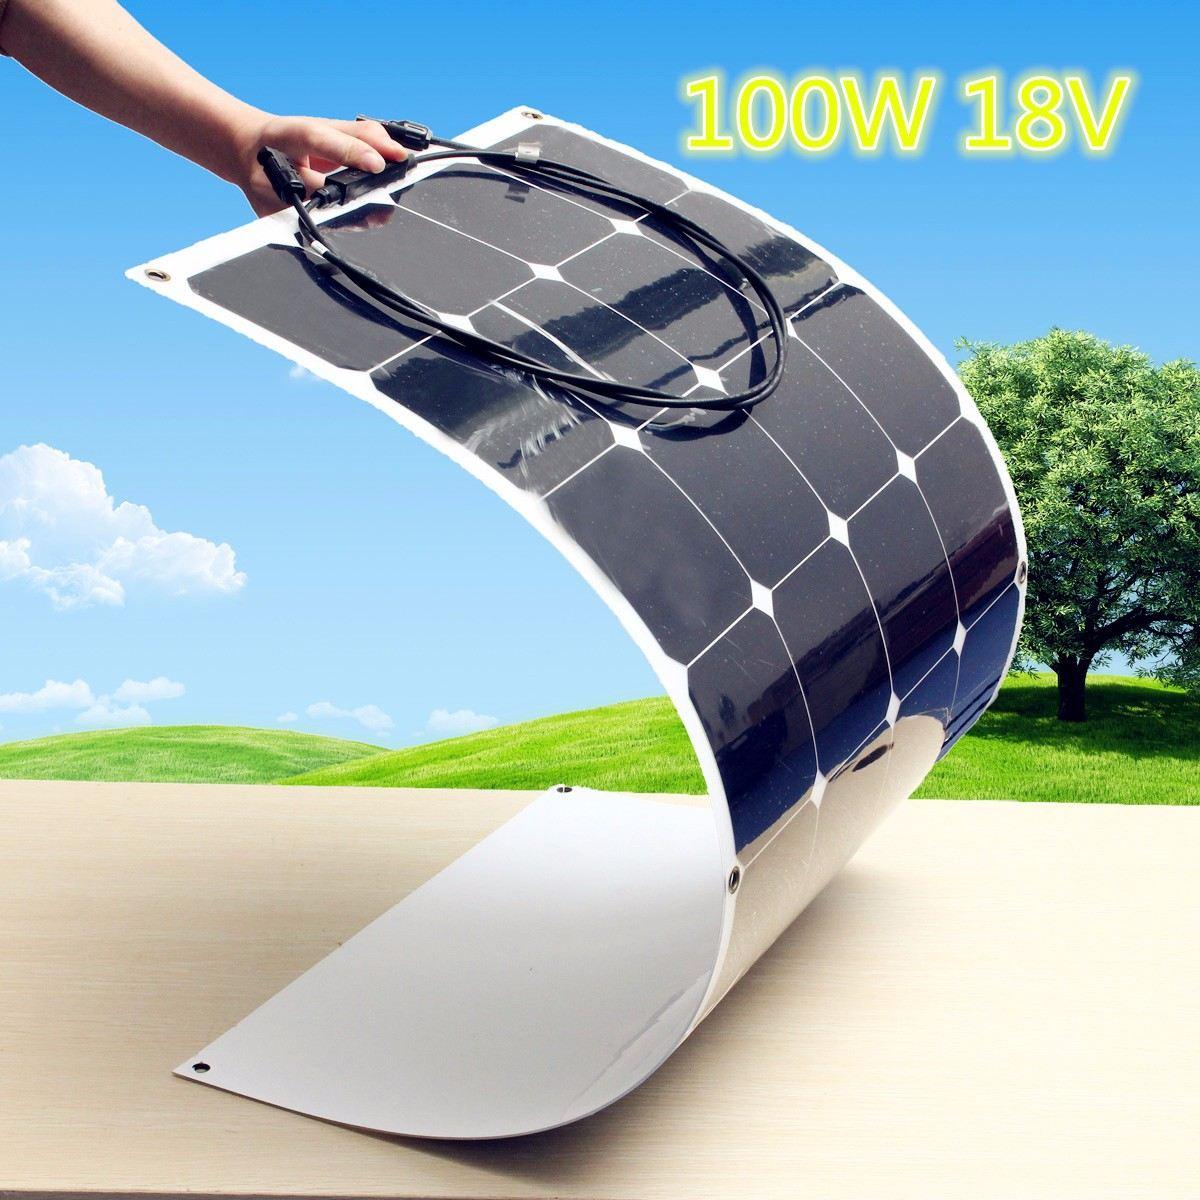 KINCO 100W 18V Semi Flexible Monocrystalline Solar Panel Waterproof High Conversion Efficiency For RV Boat Car + 1.5m Cable